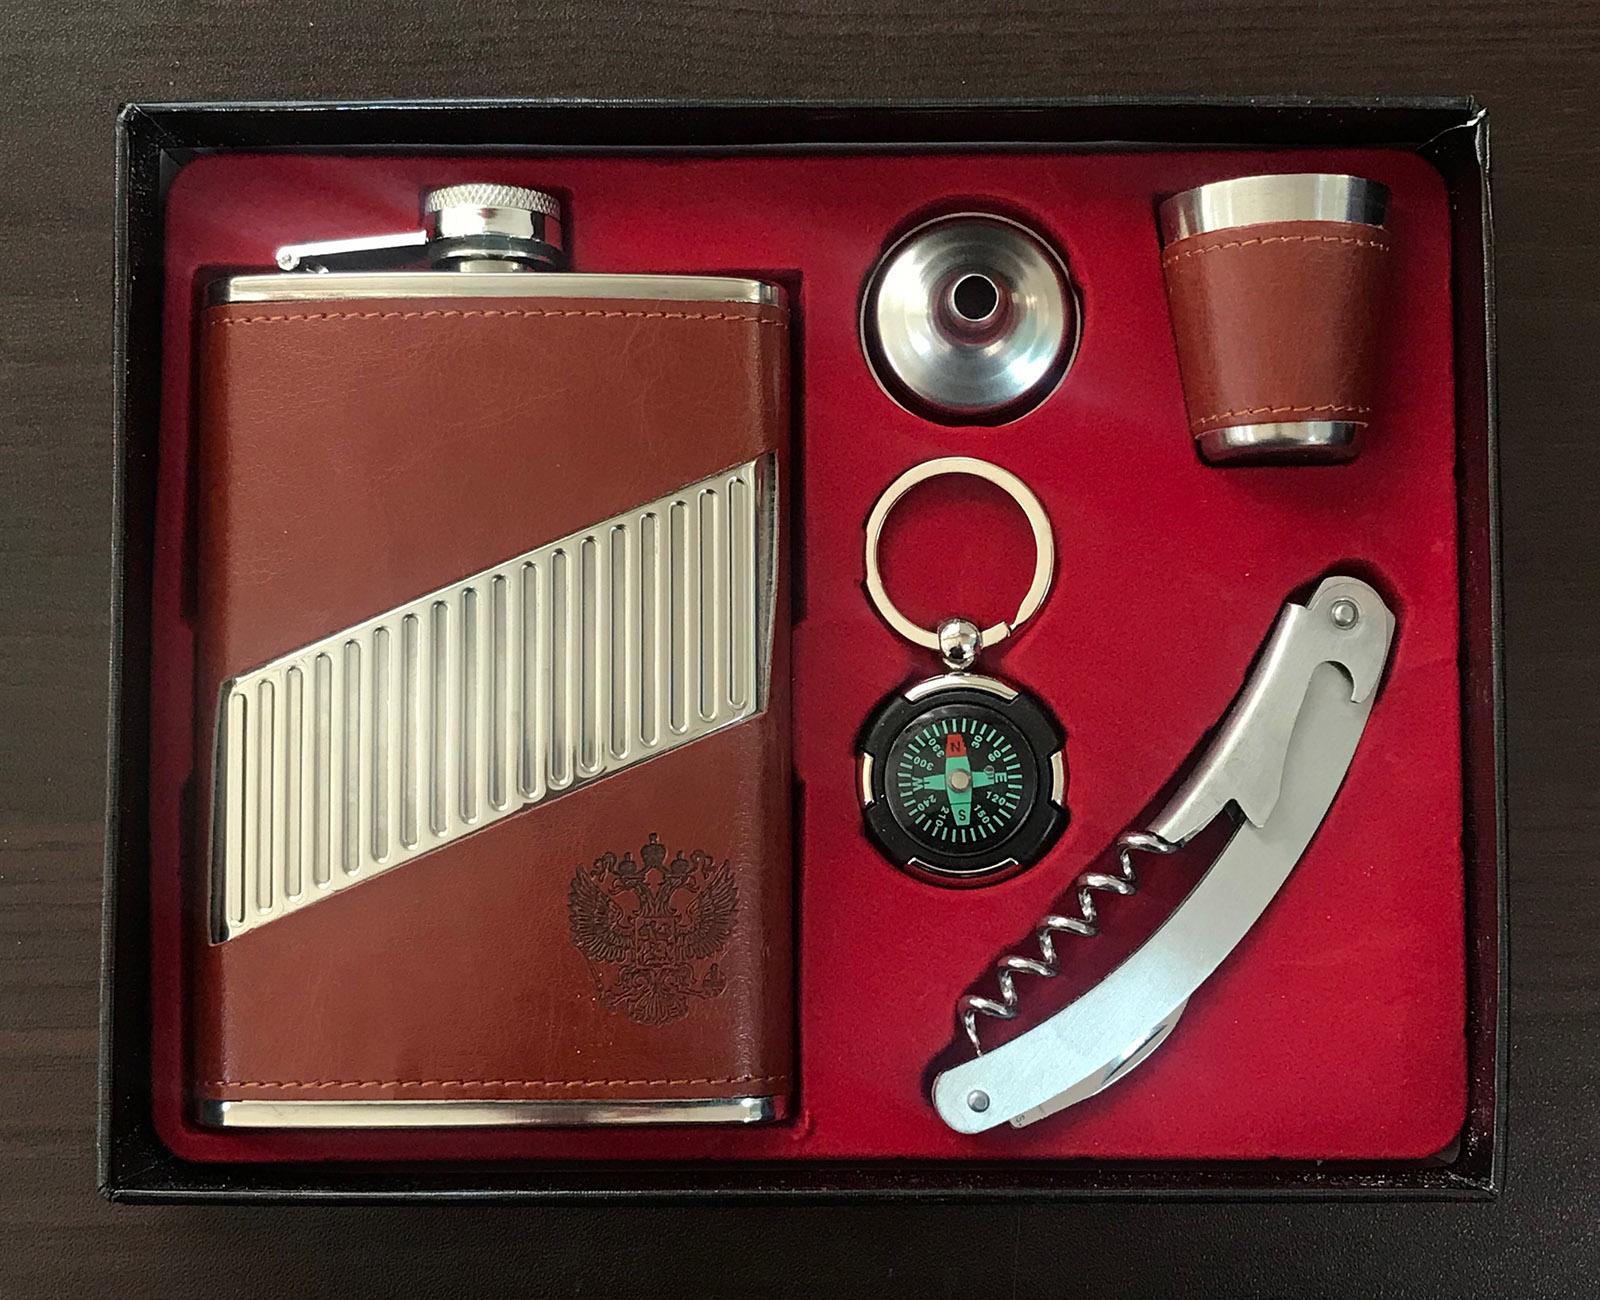 Набор подарок мужчине: фляга, мультитул, стопка, воронка и брелок